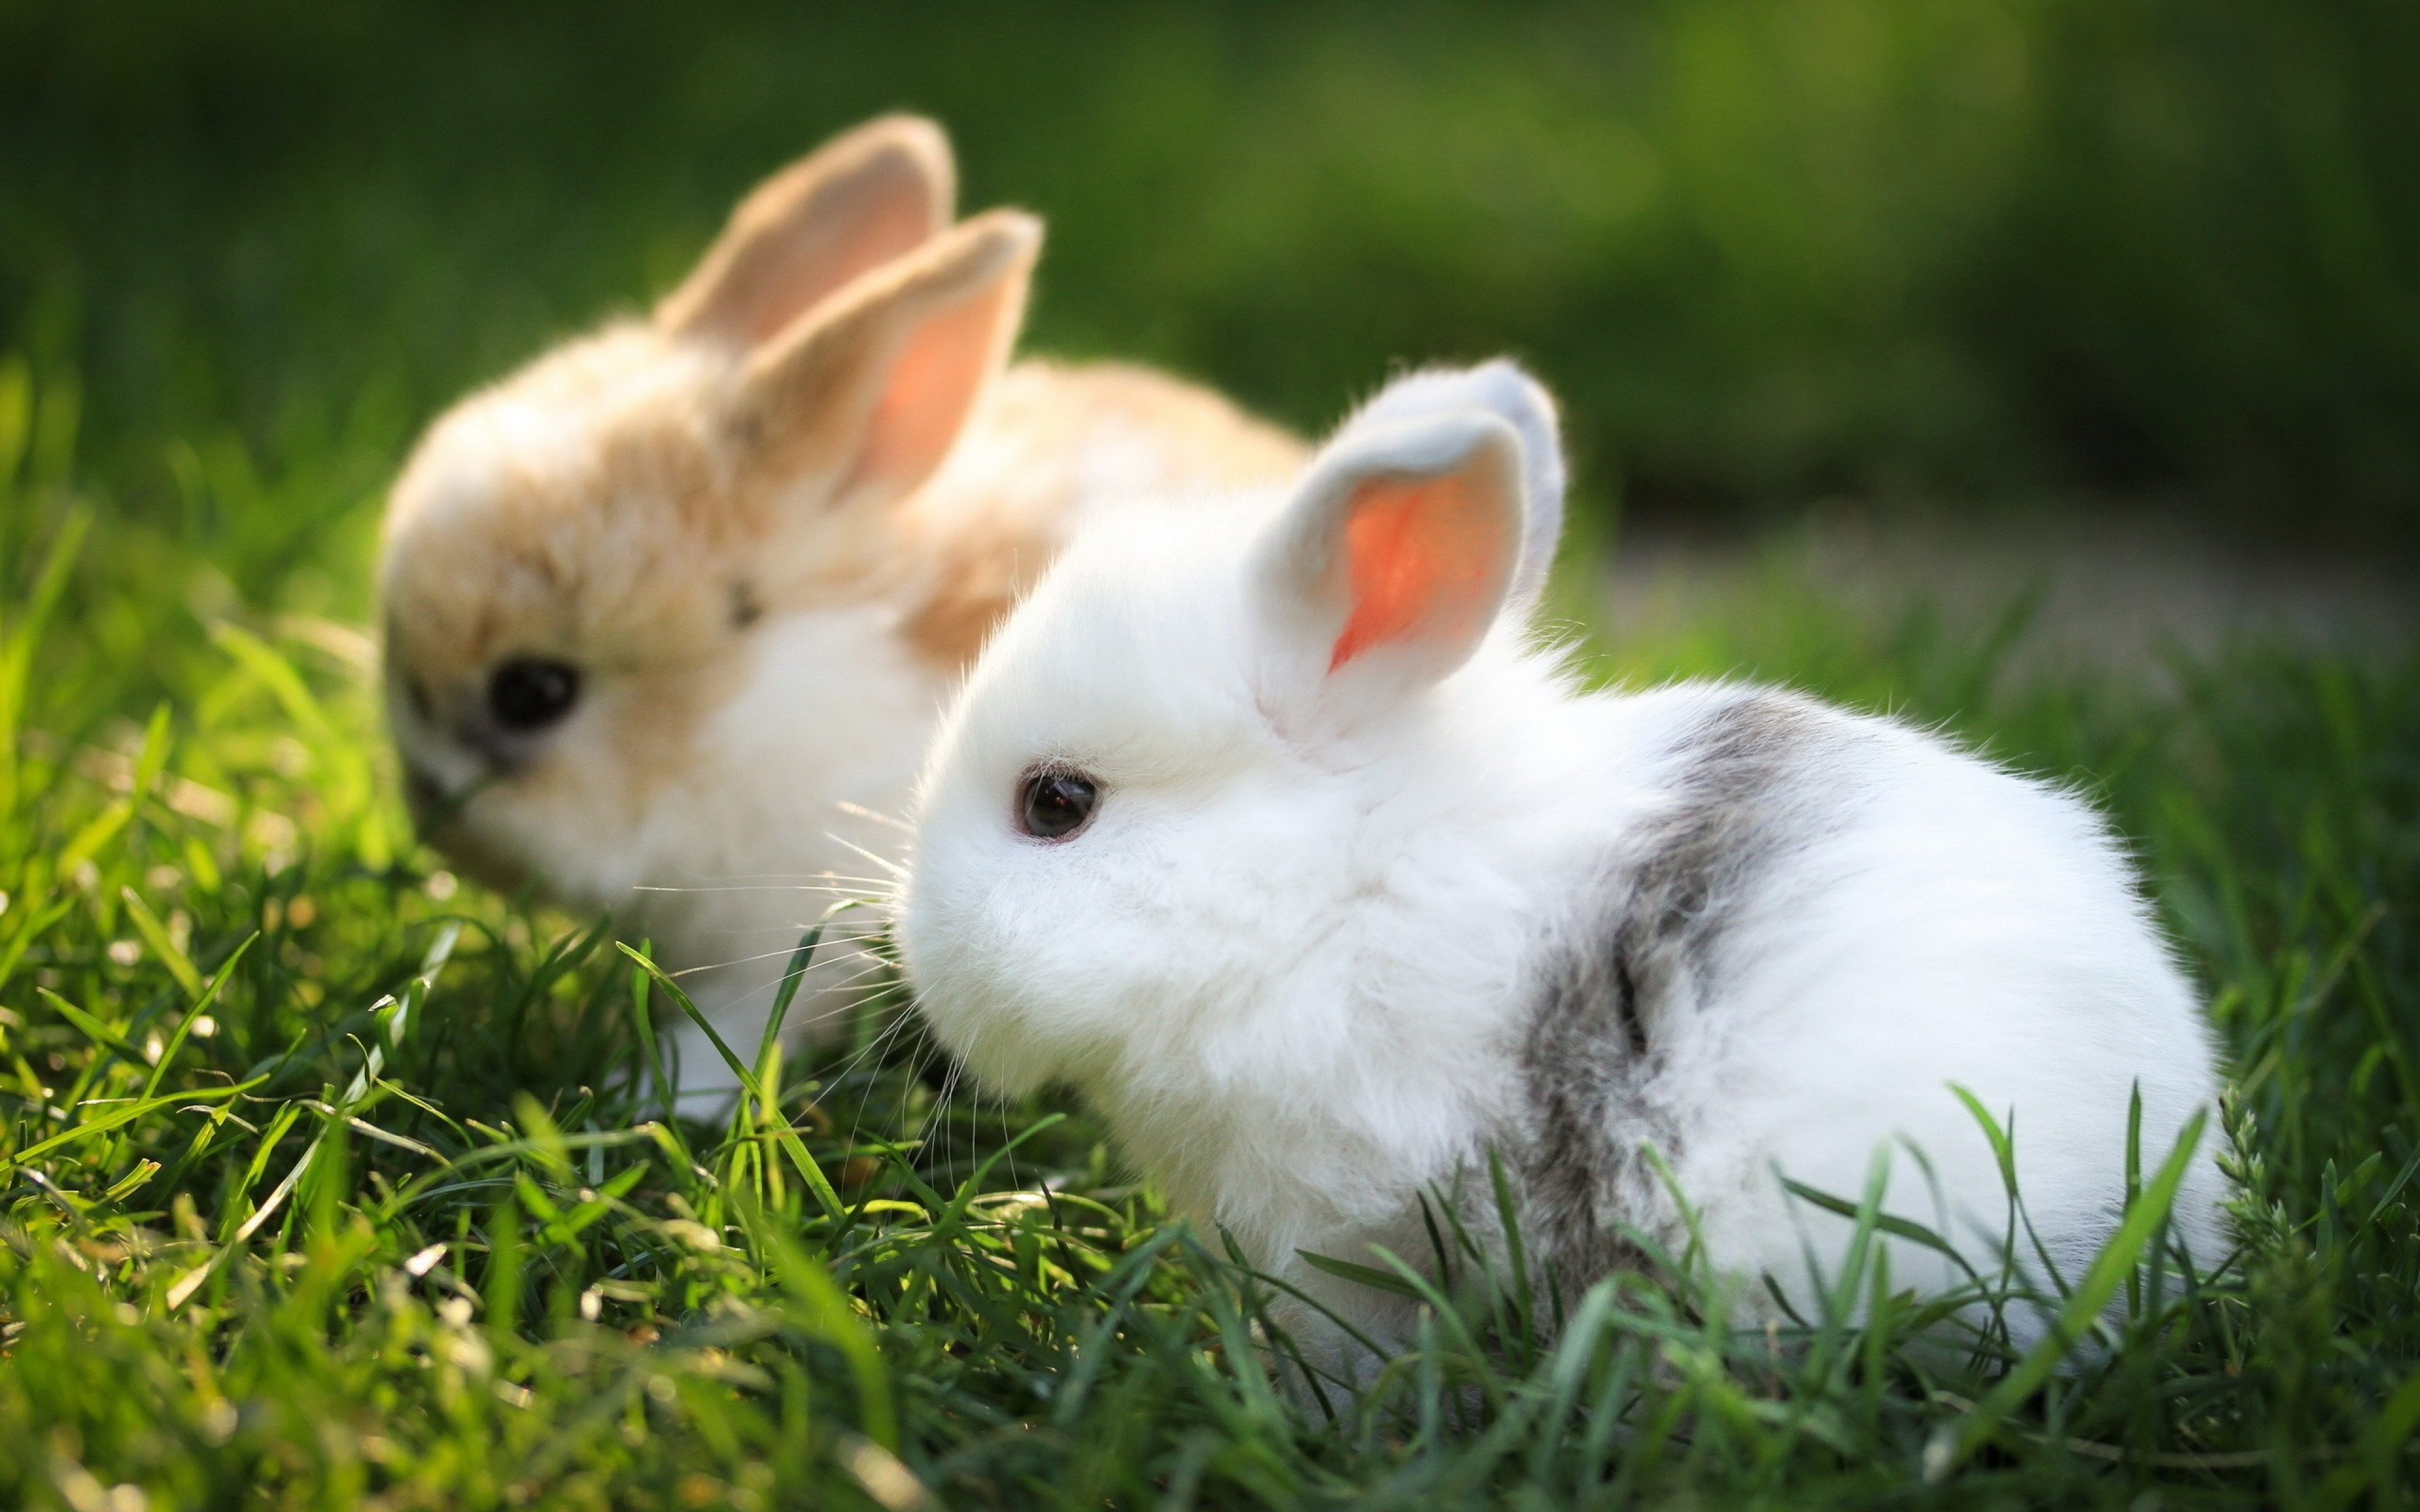 rabbits_couple_grass_fur_beautiful_44836_3840x2400